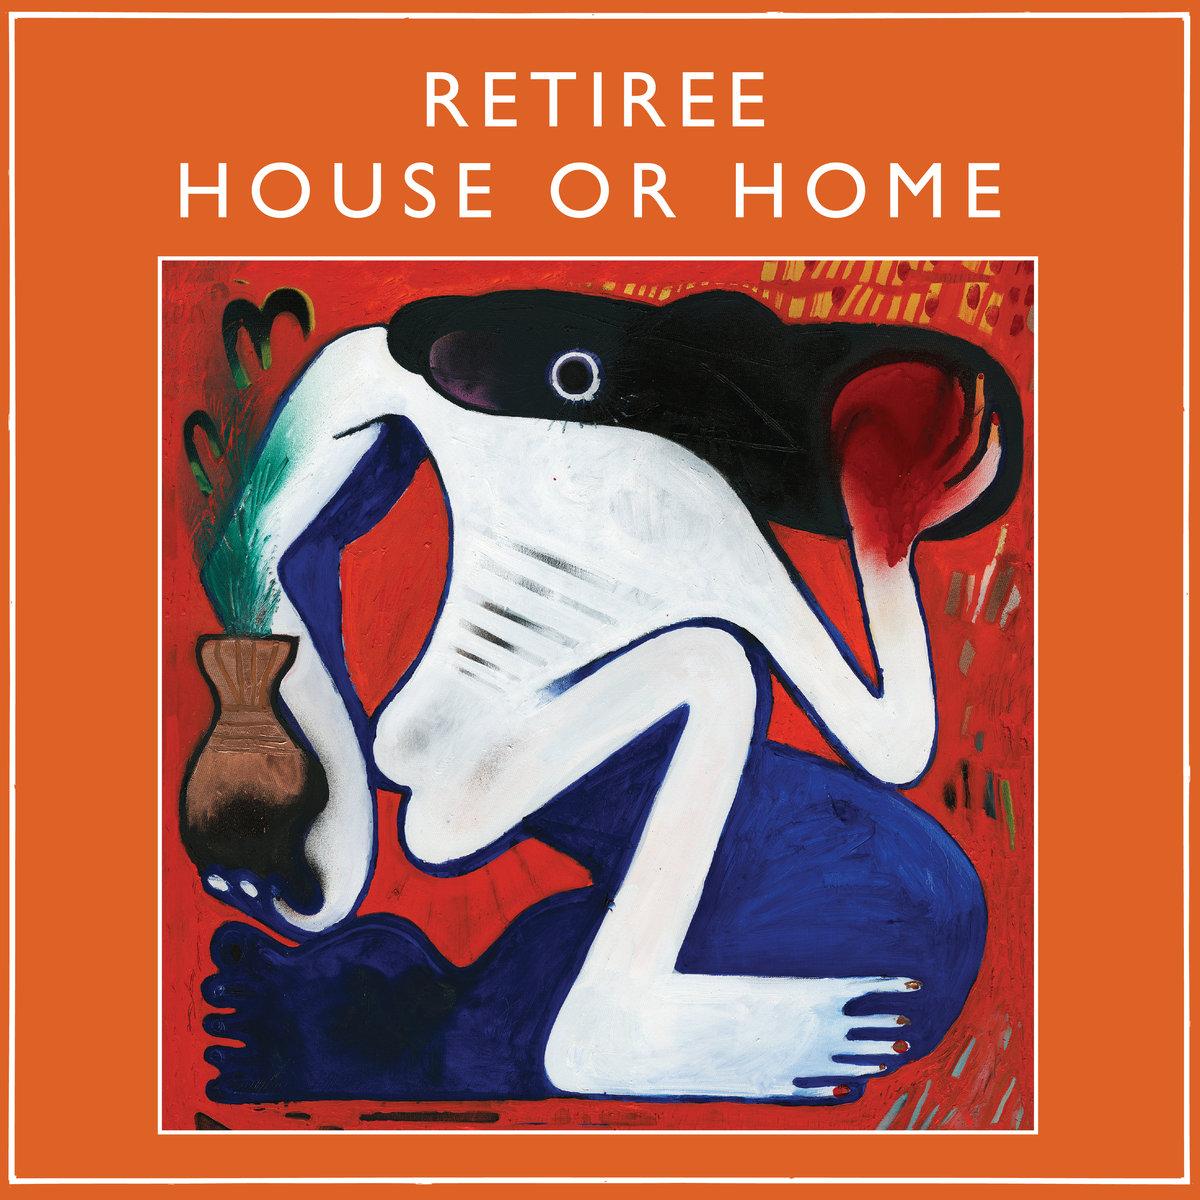 RETIREE - HOUSE OR HOME - AlbumMIXED